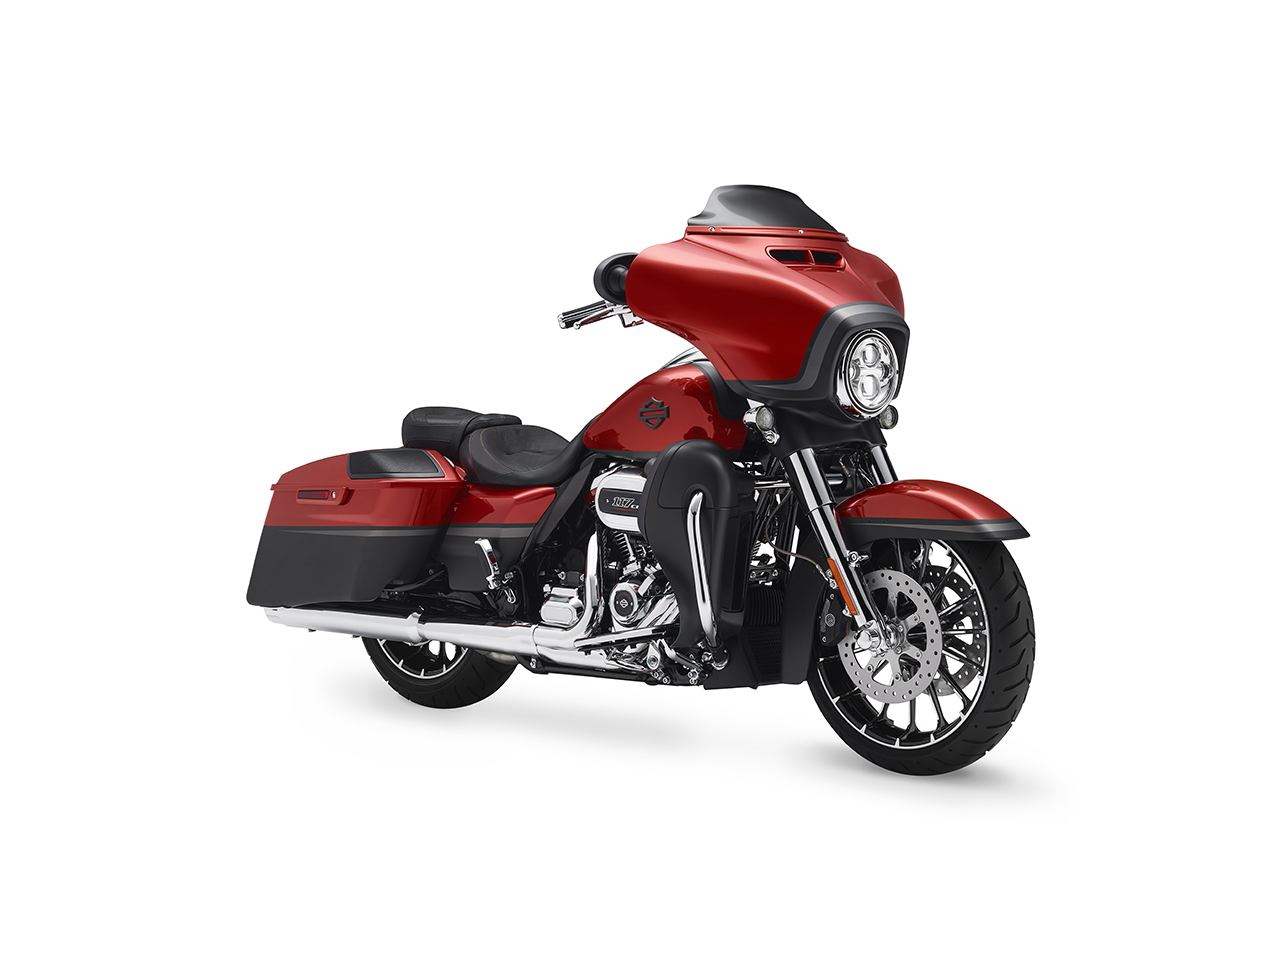 2018 Harley-Davidson CVO Street Glide Image